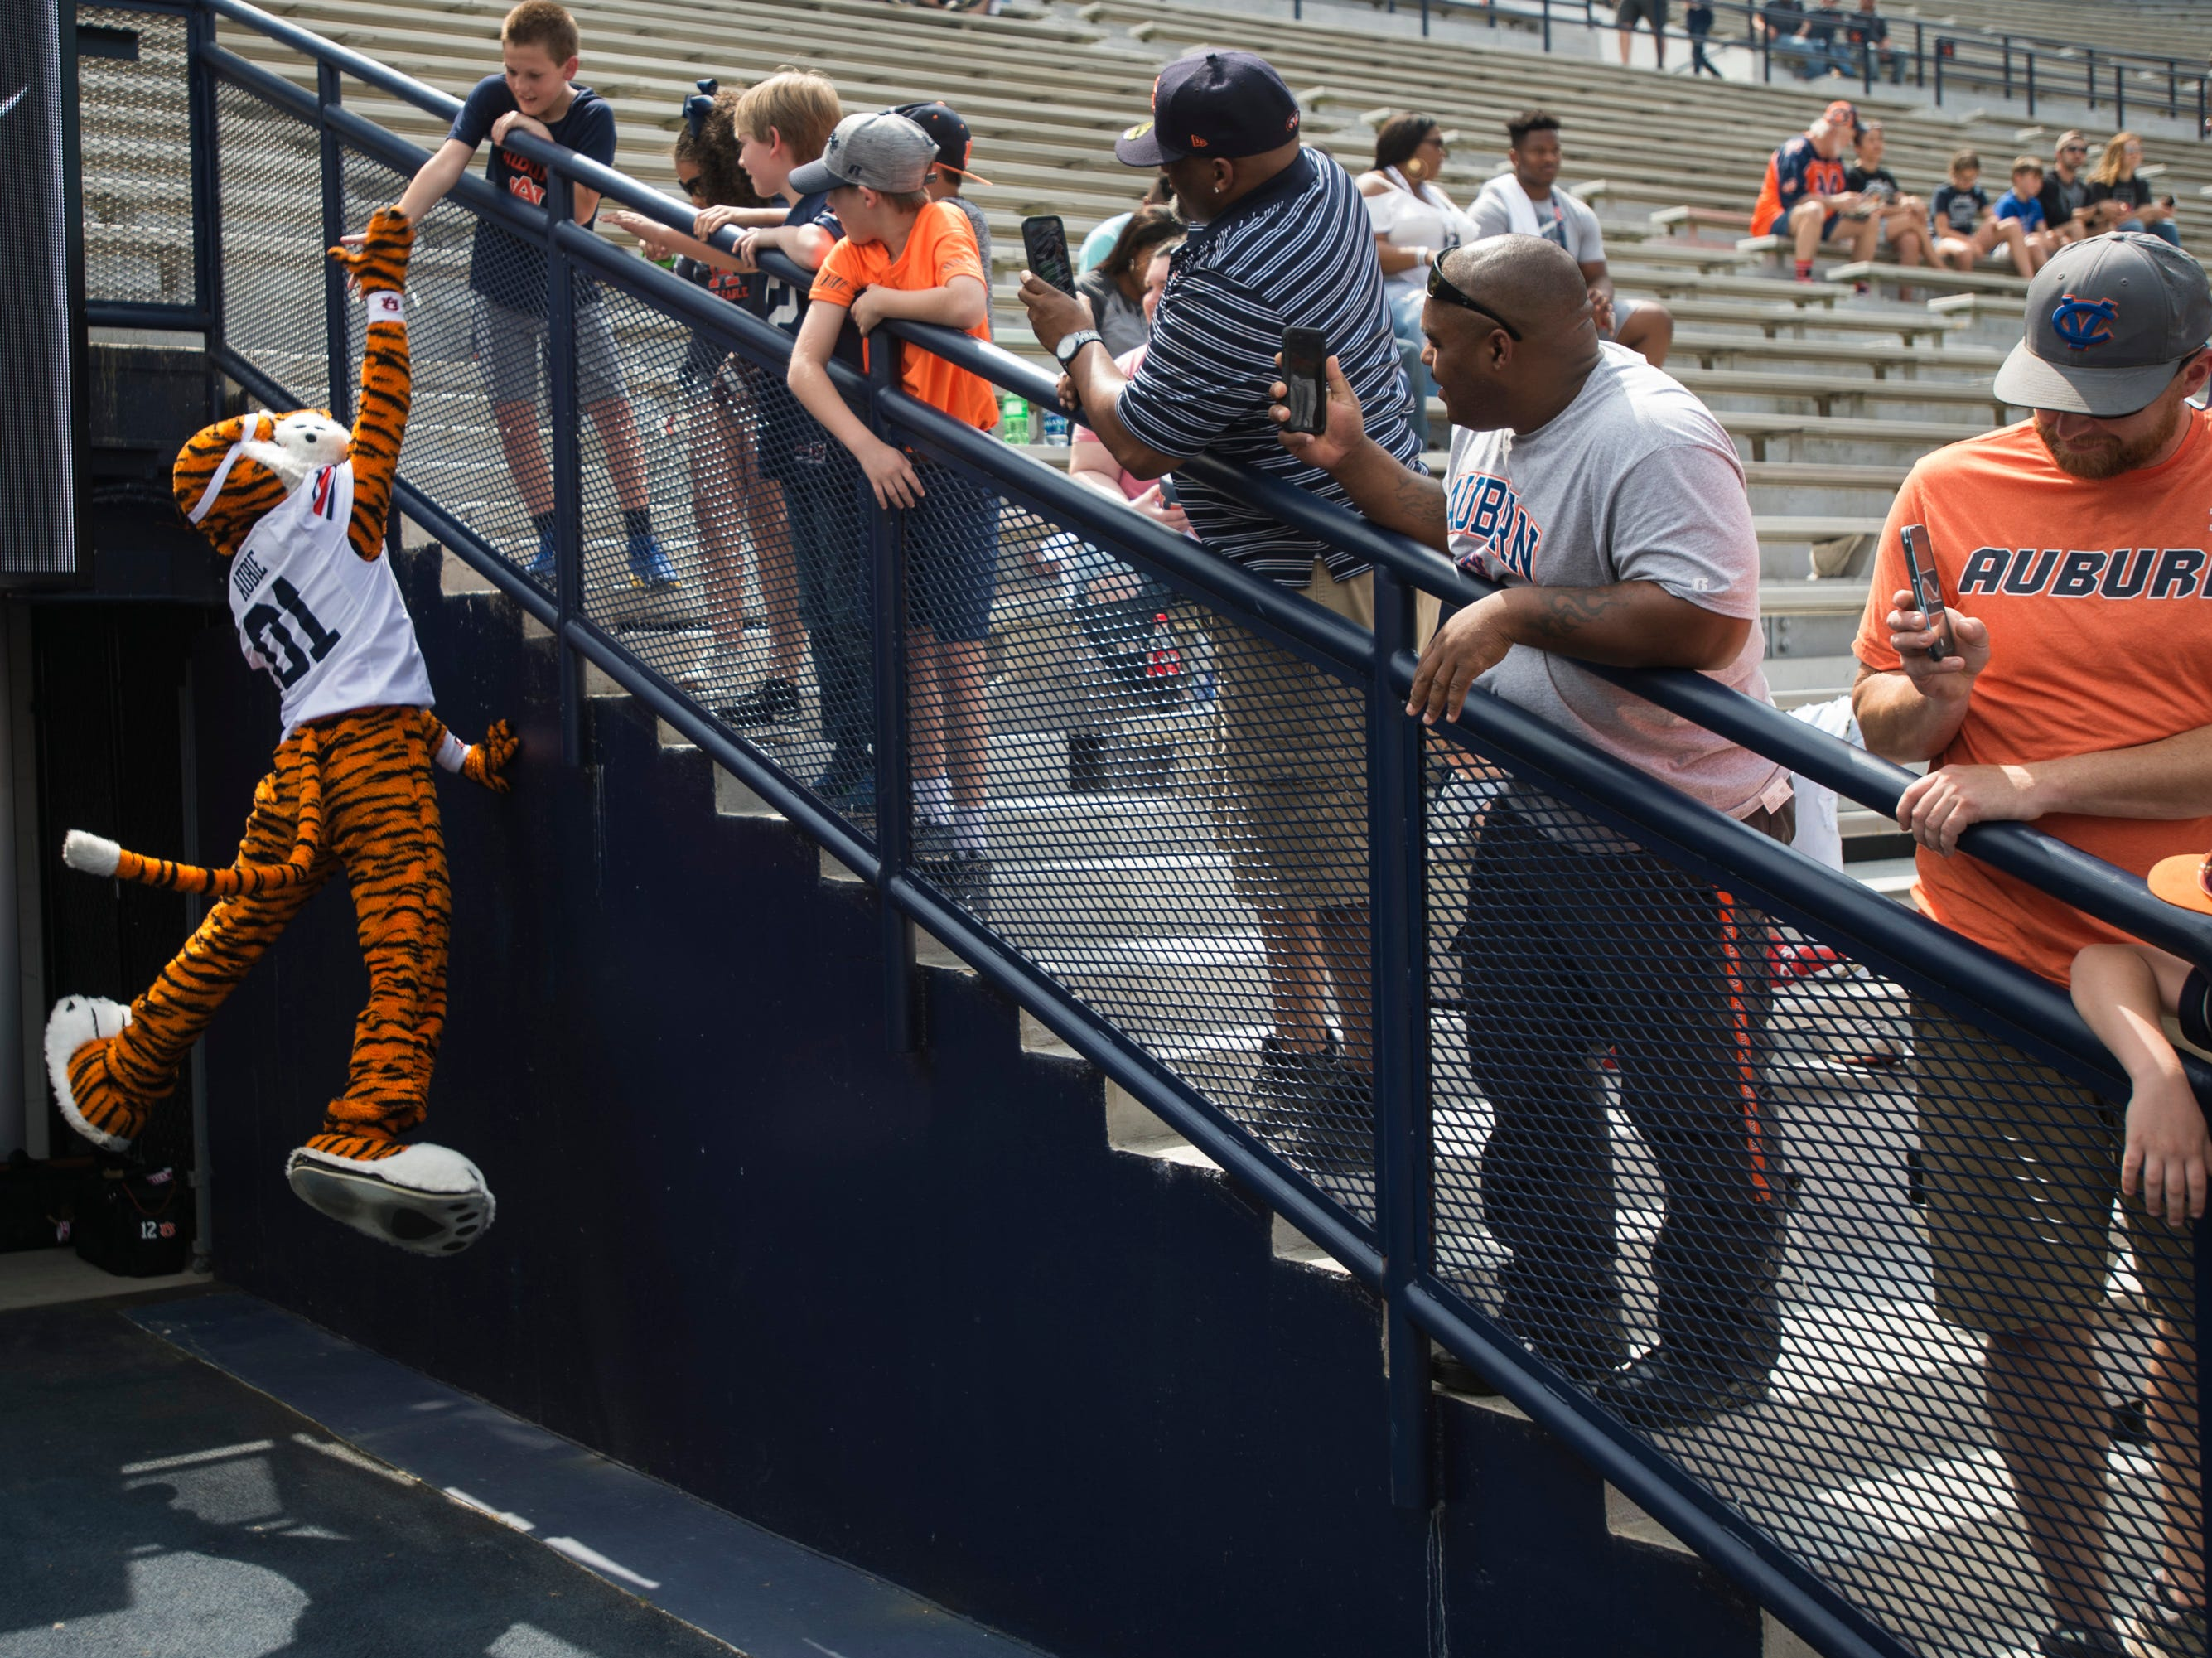 Auburn mascot, Aubie, high fives a fan during the A-Day spring practice gameat Jordan-Hare Stadium in Auburn, Ala., on Saturday, April 13, 2019.